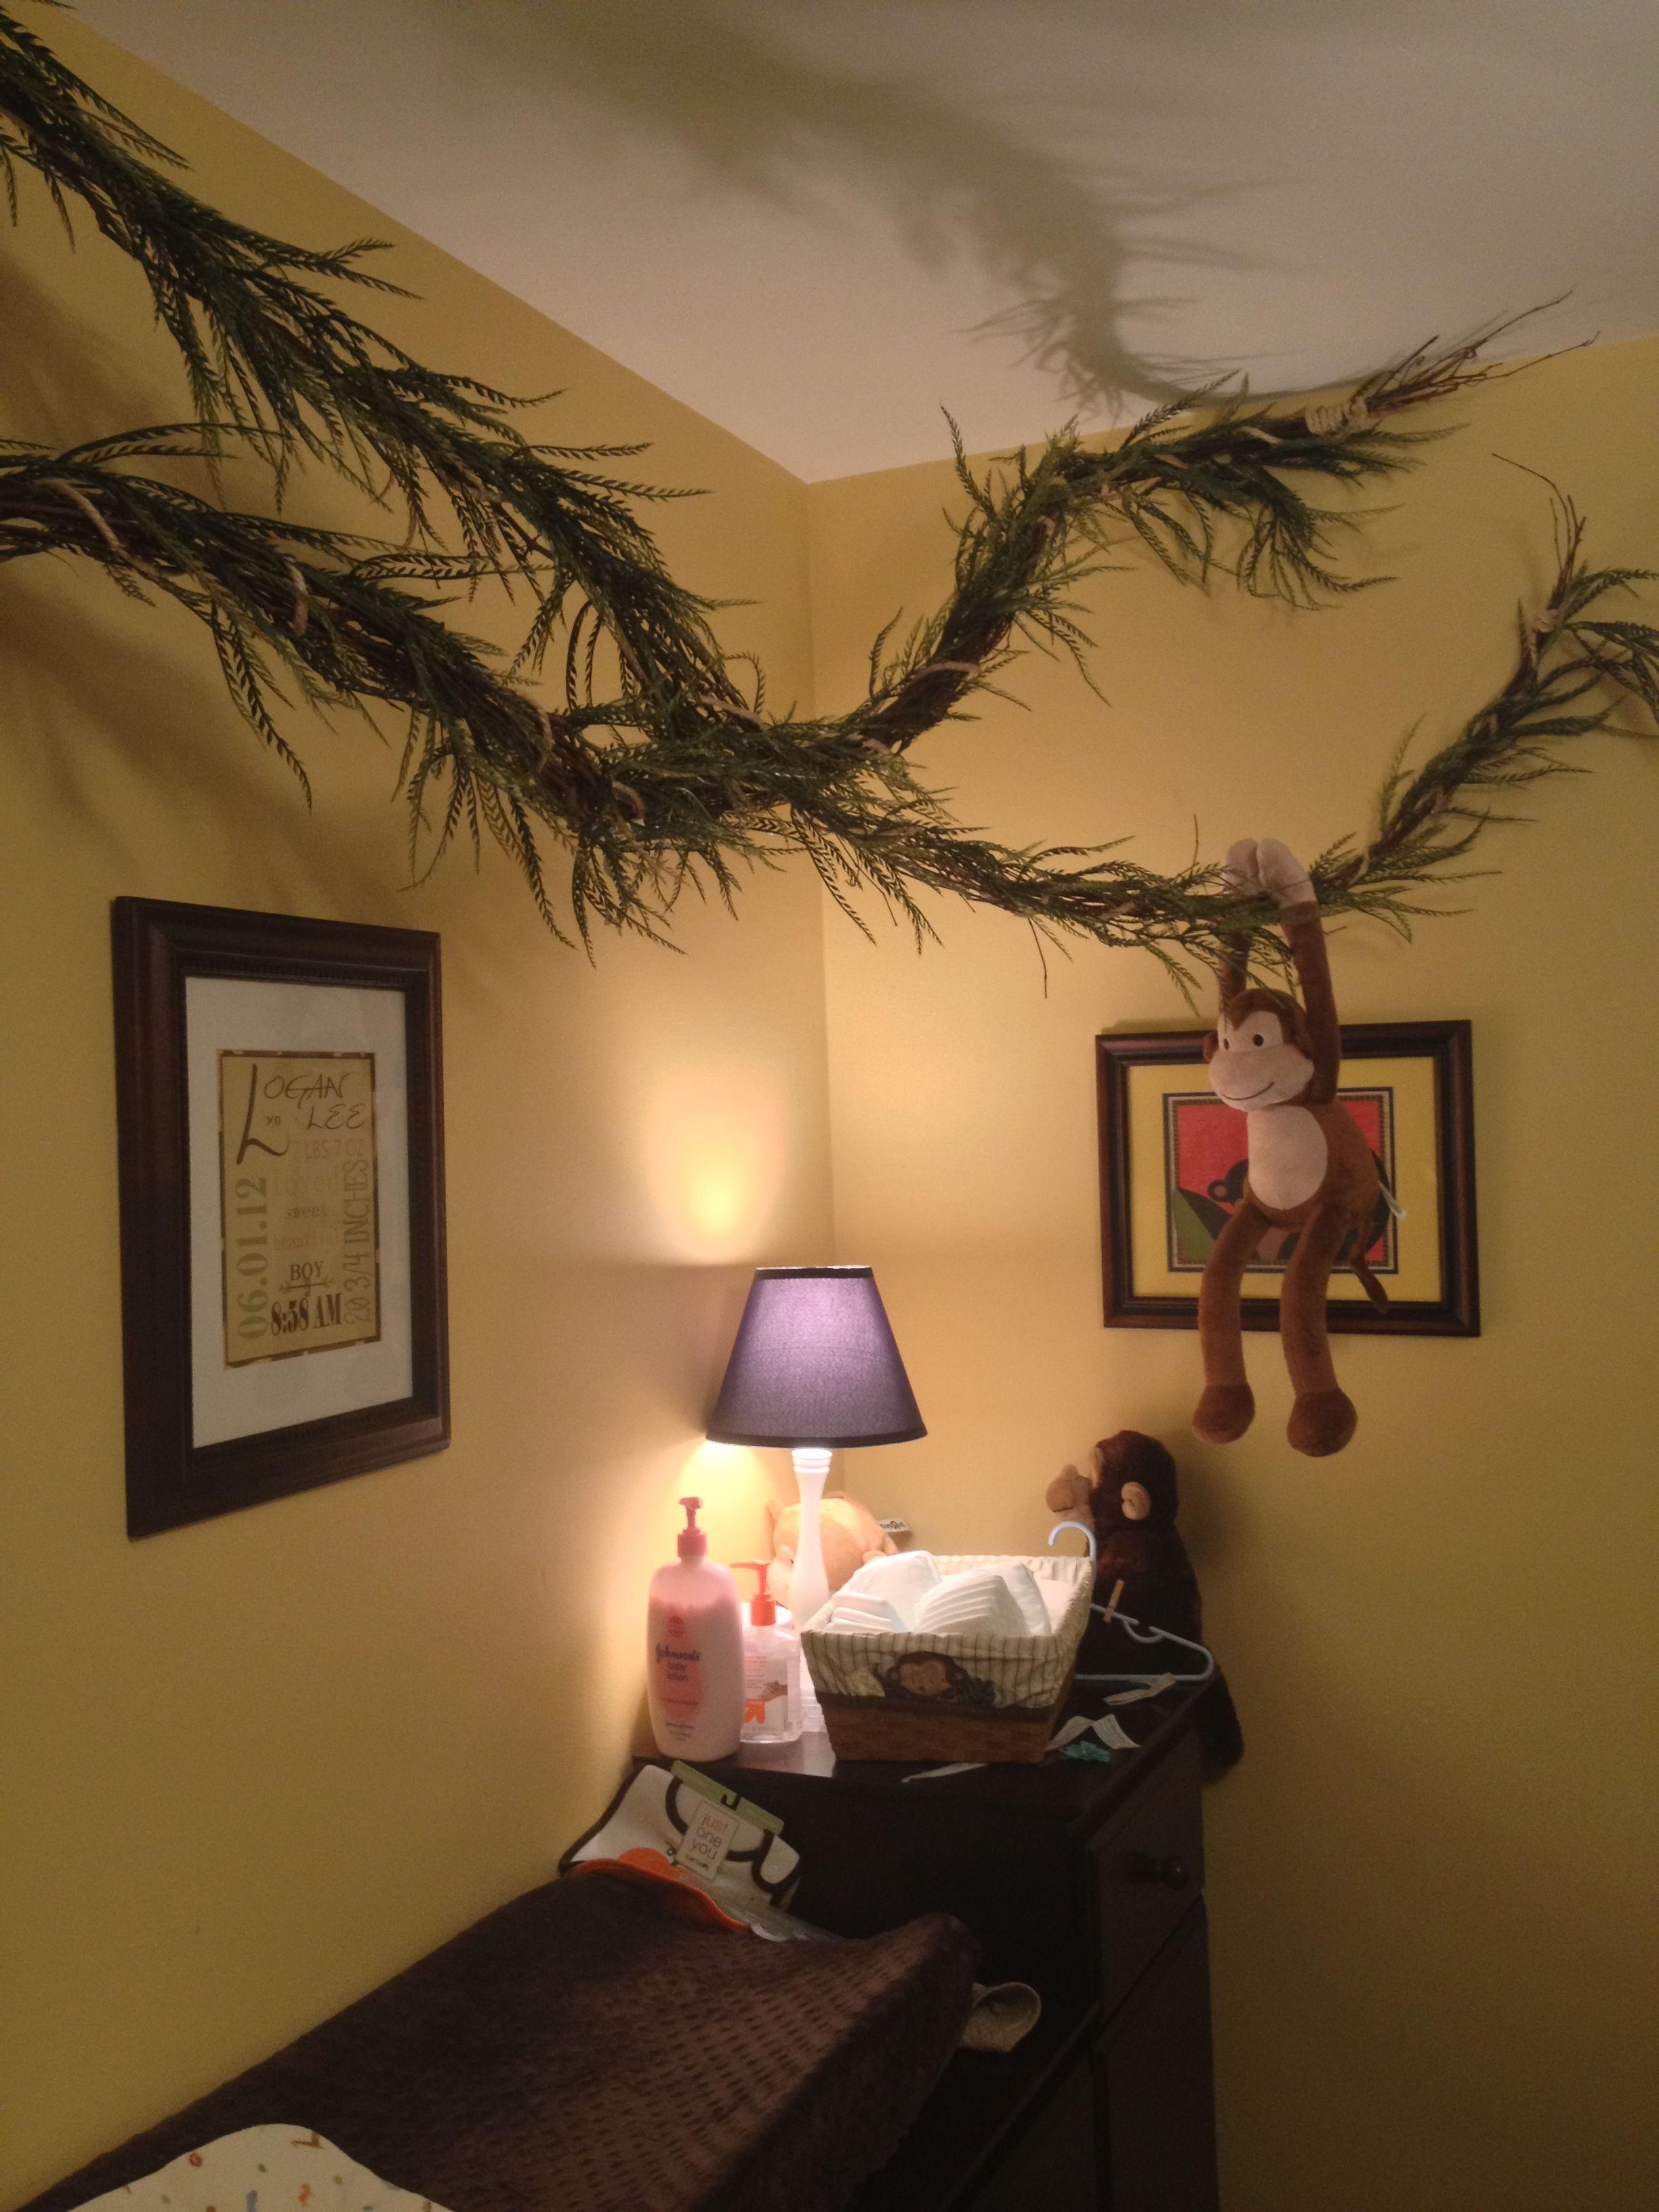 Loft bedroom no door  Loganus jungle nursery added even more monkeys to entertain him